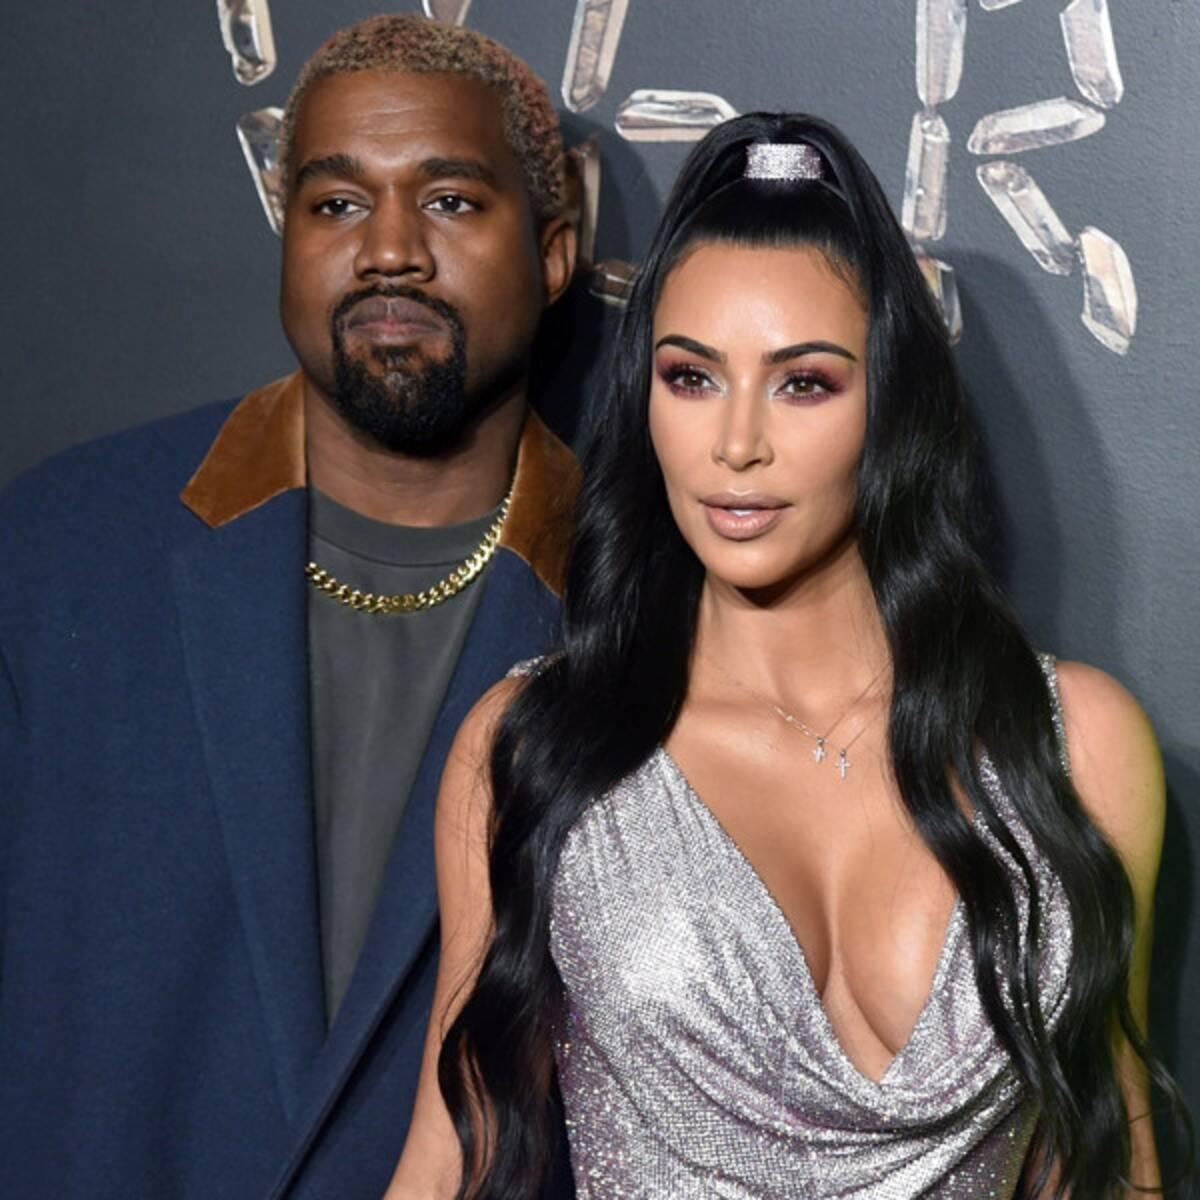 Kim Kardashian – Kanye West: Αγωγή – μαμούθ στον πρώην σωματοφύλακά τους, ύστερα από τις αποκαλύψεις του!